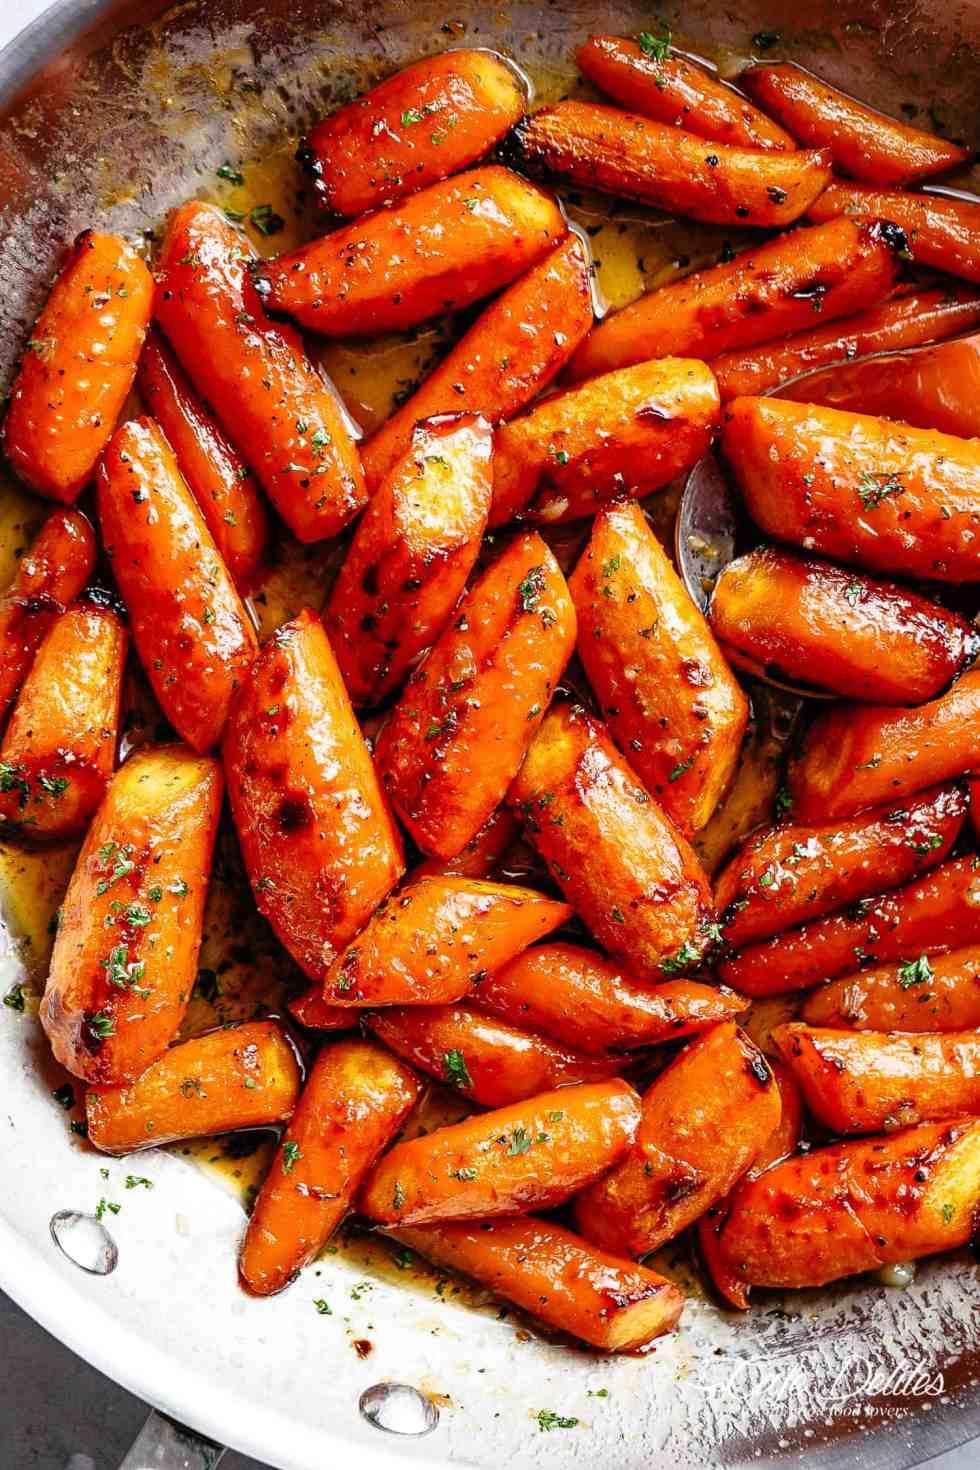 Roasted Carrots with honey glaze